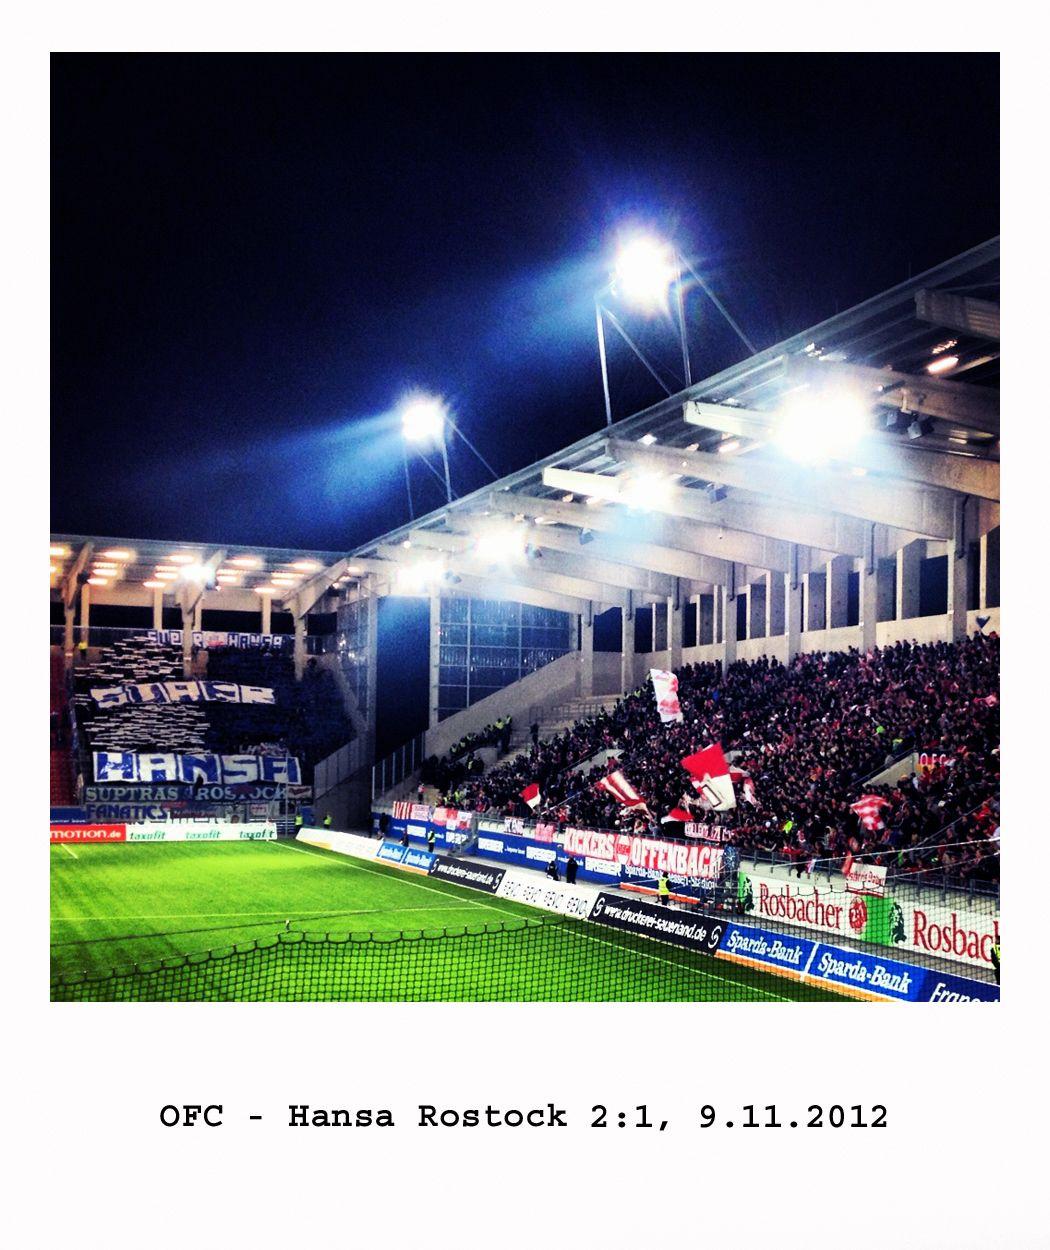 Ofc Hansa Rostock Kickers Offenbach Ofc Rostock Soccer Field Ofc